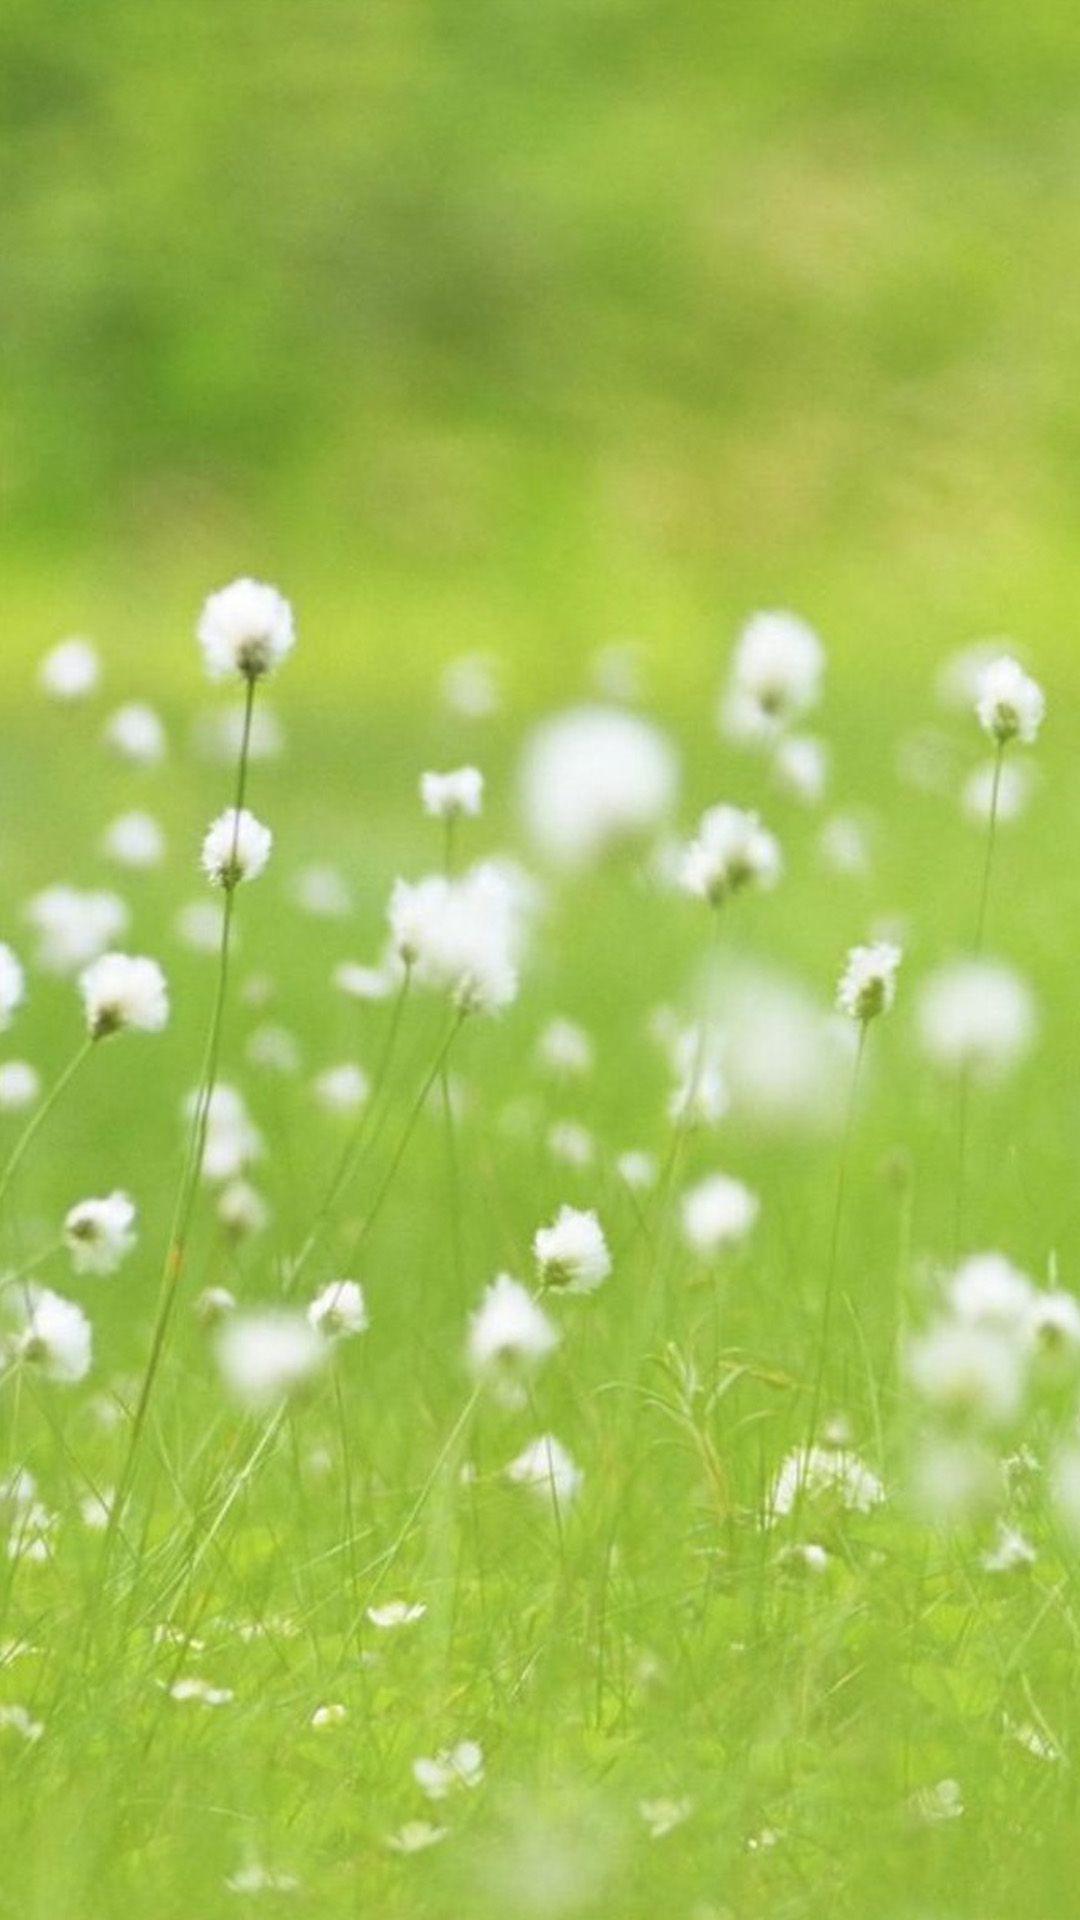 Vitality White Dandelion Plant Field iPhone 6 wallpaper